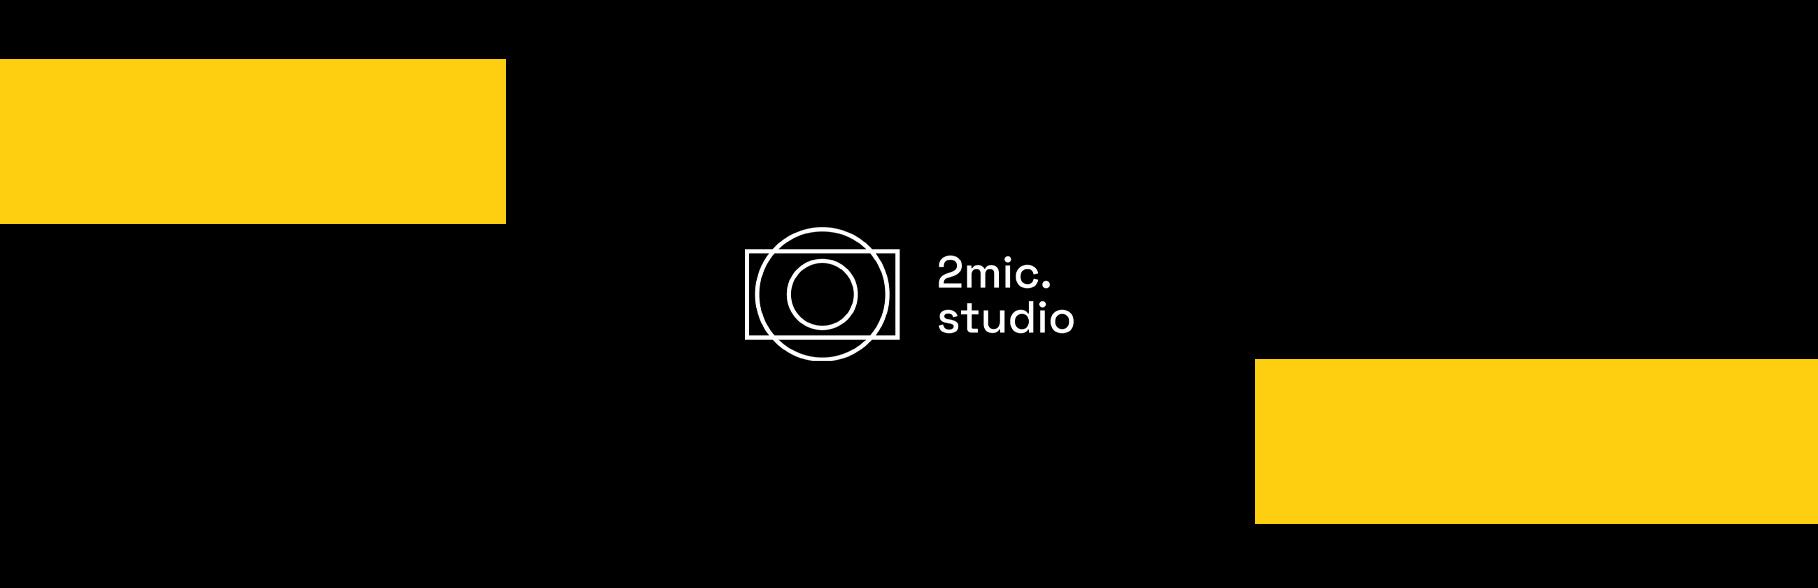 2mic.studio